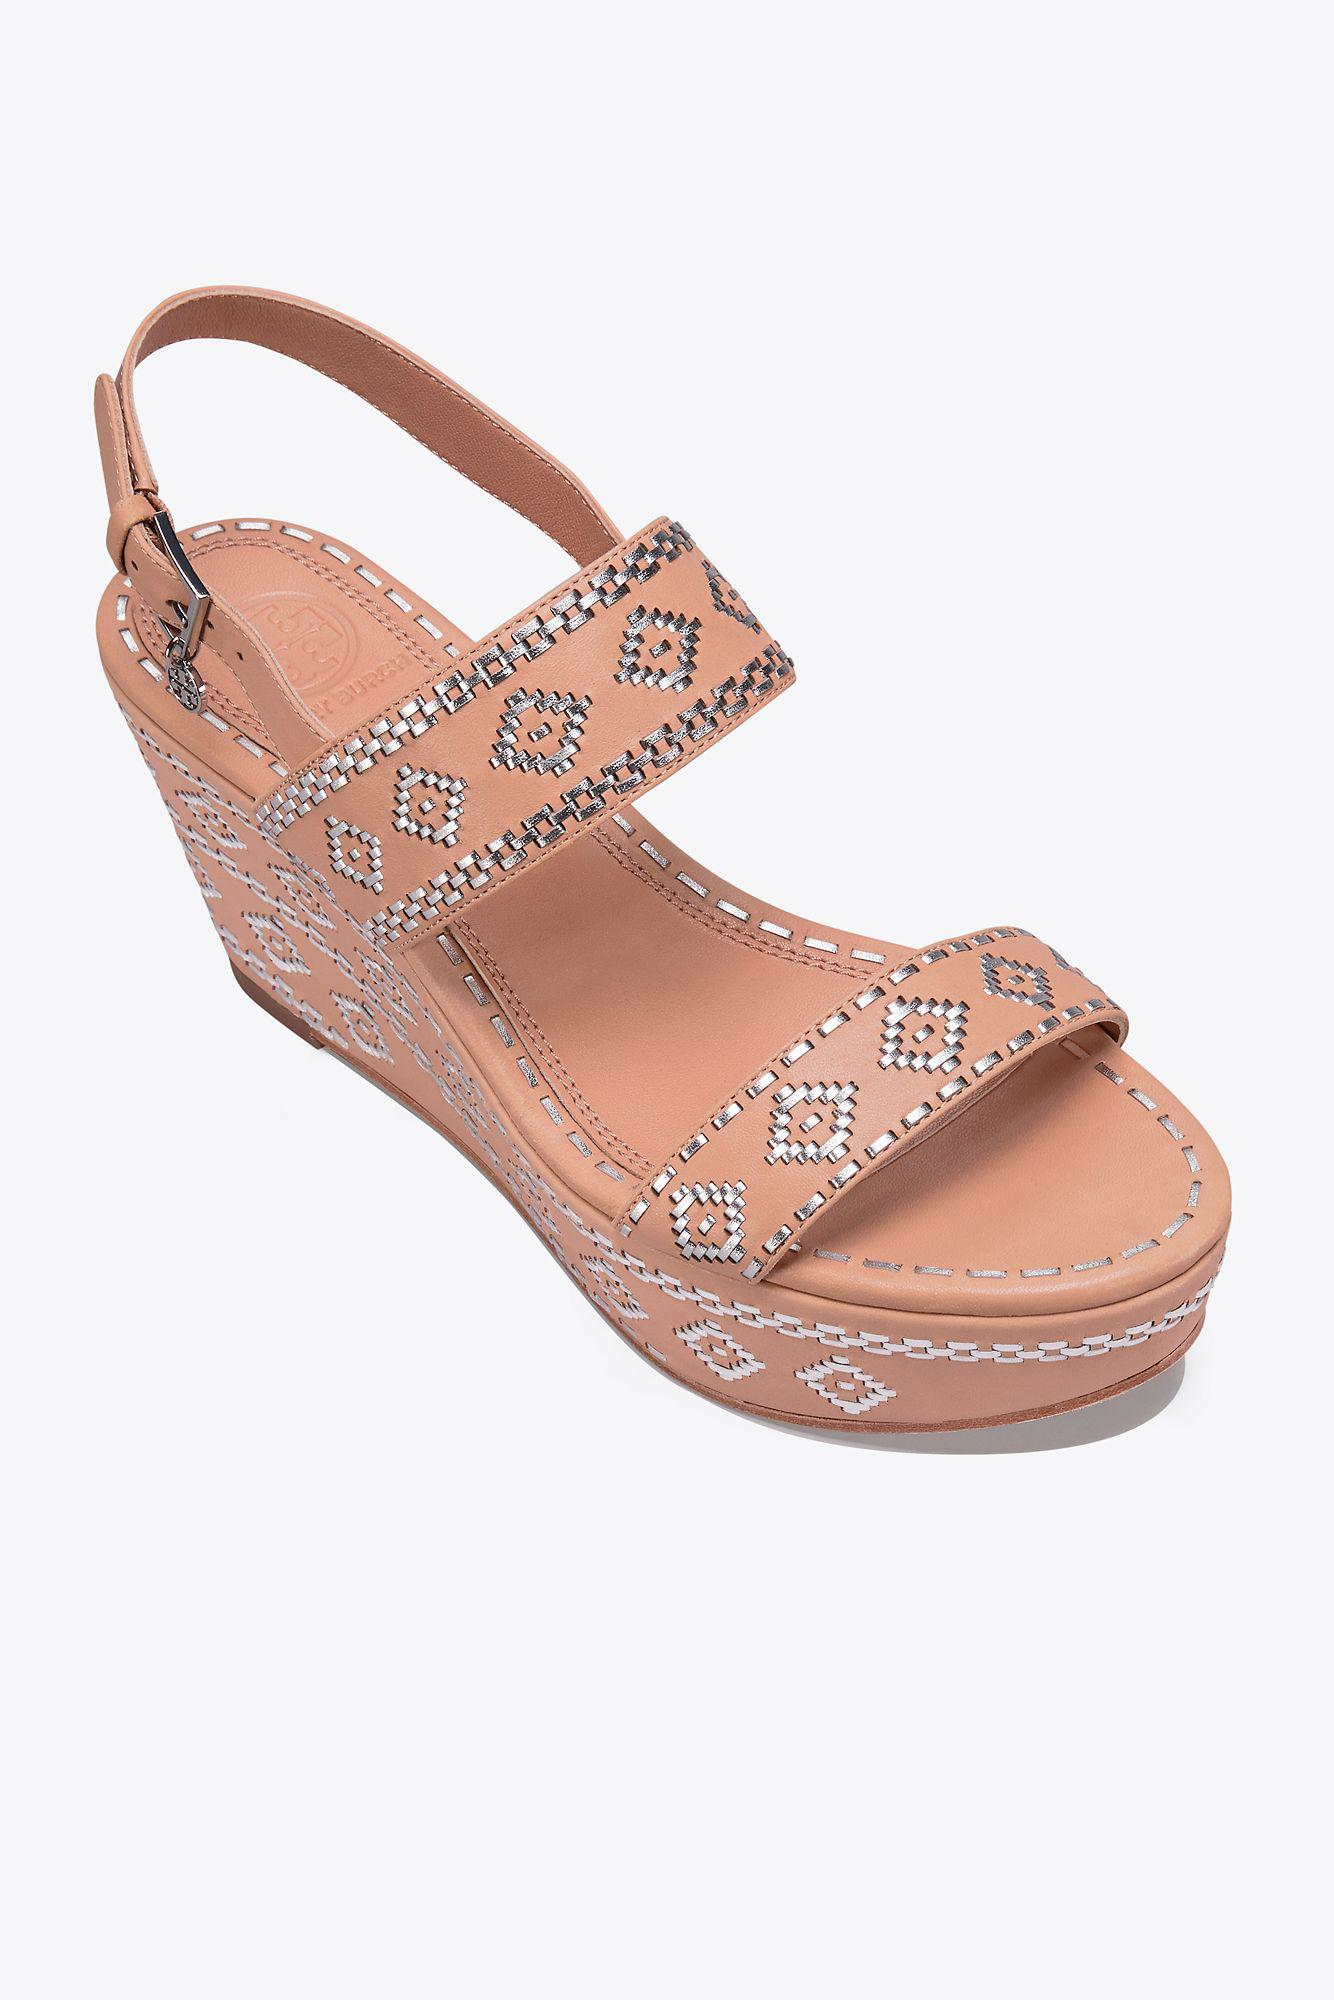 648b86b8cc7316 Lyst - Tory Burch Blake Ankle-strap Wedge Sandal